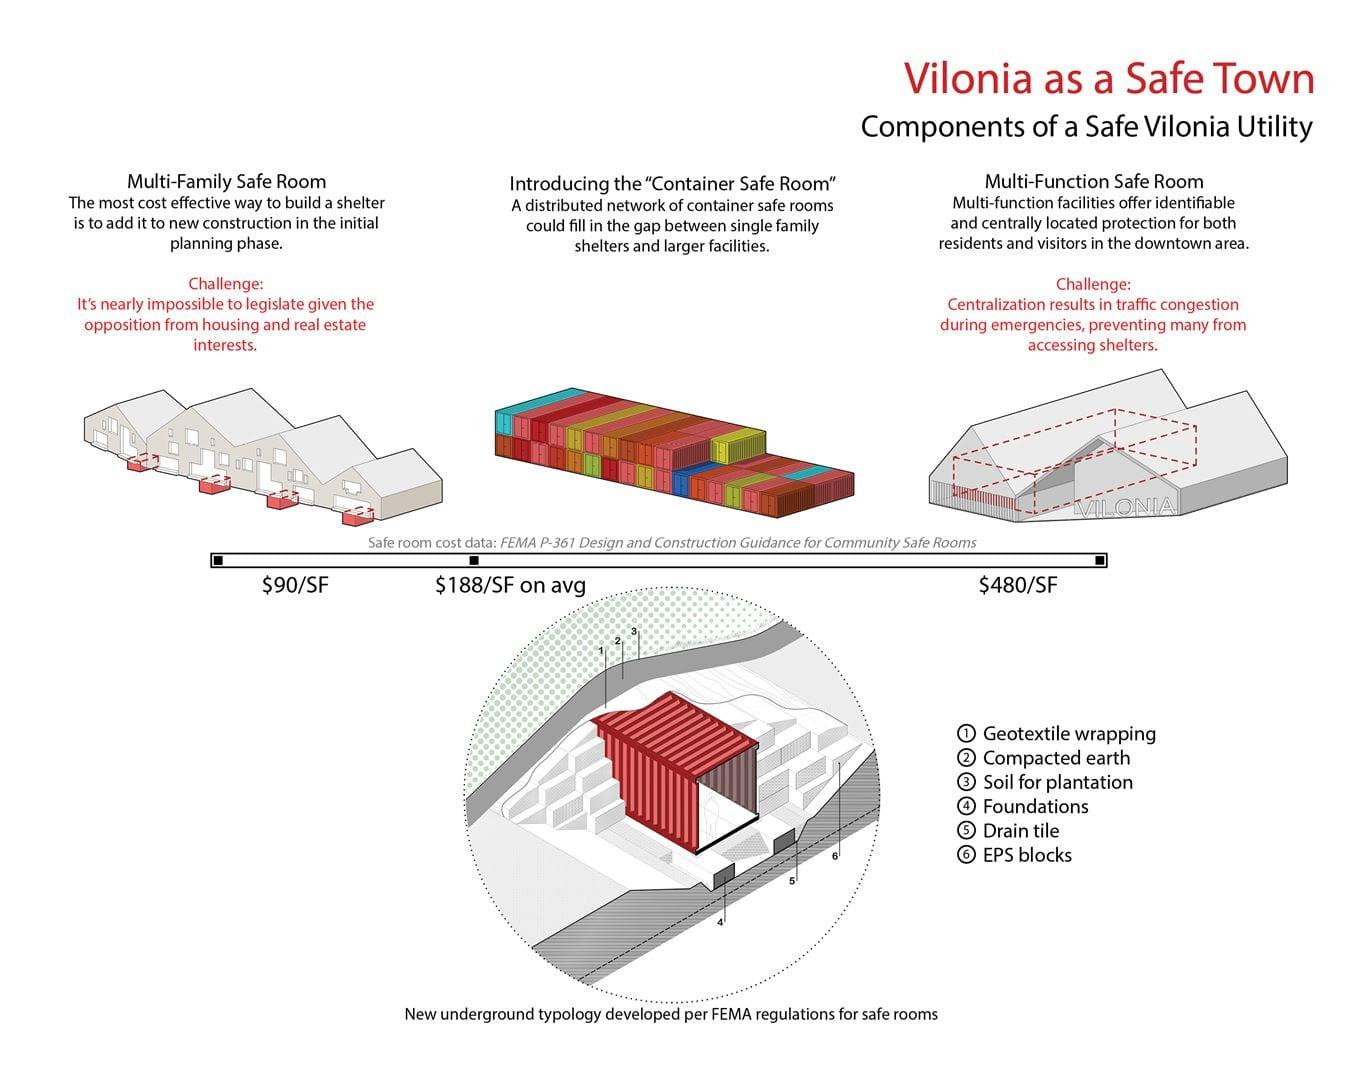 UACDC_Vilonia Image7 (Exhibit) (Copy)